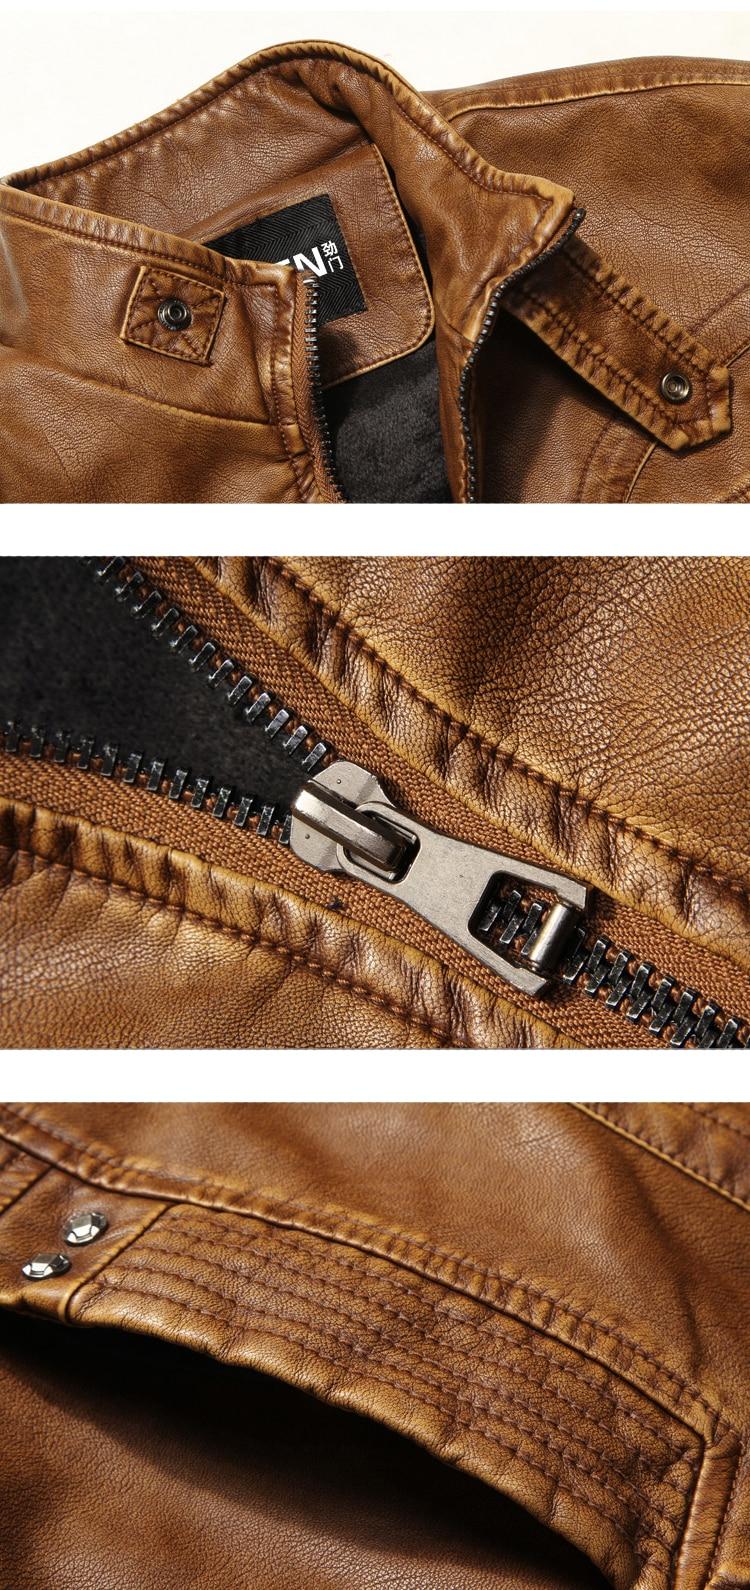 Dimusi outono inverno dos homens do plutônio jaqueta de couro da motocicleta casacos de couro masculino negócios casacos de couro jaqueta de couro masculin